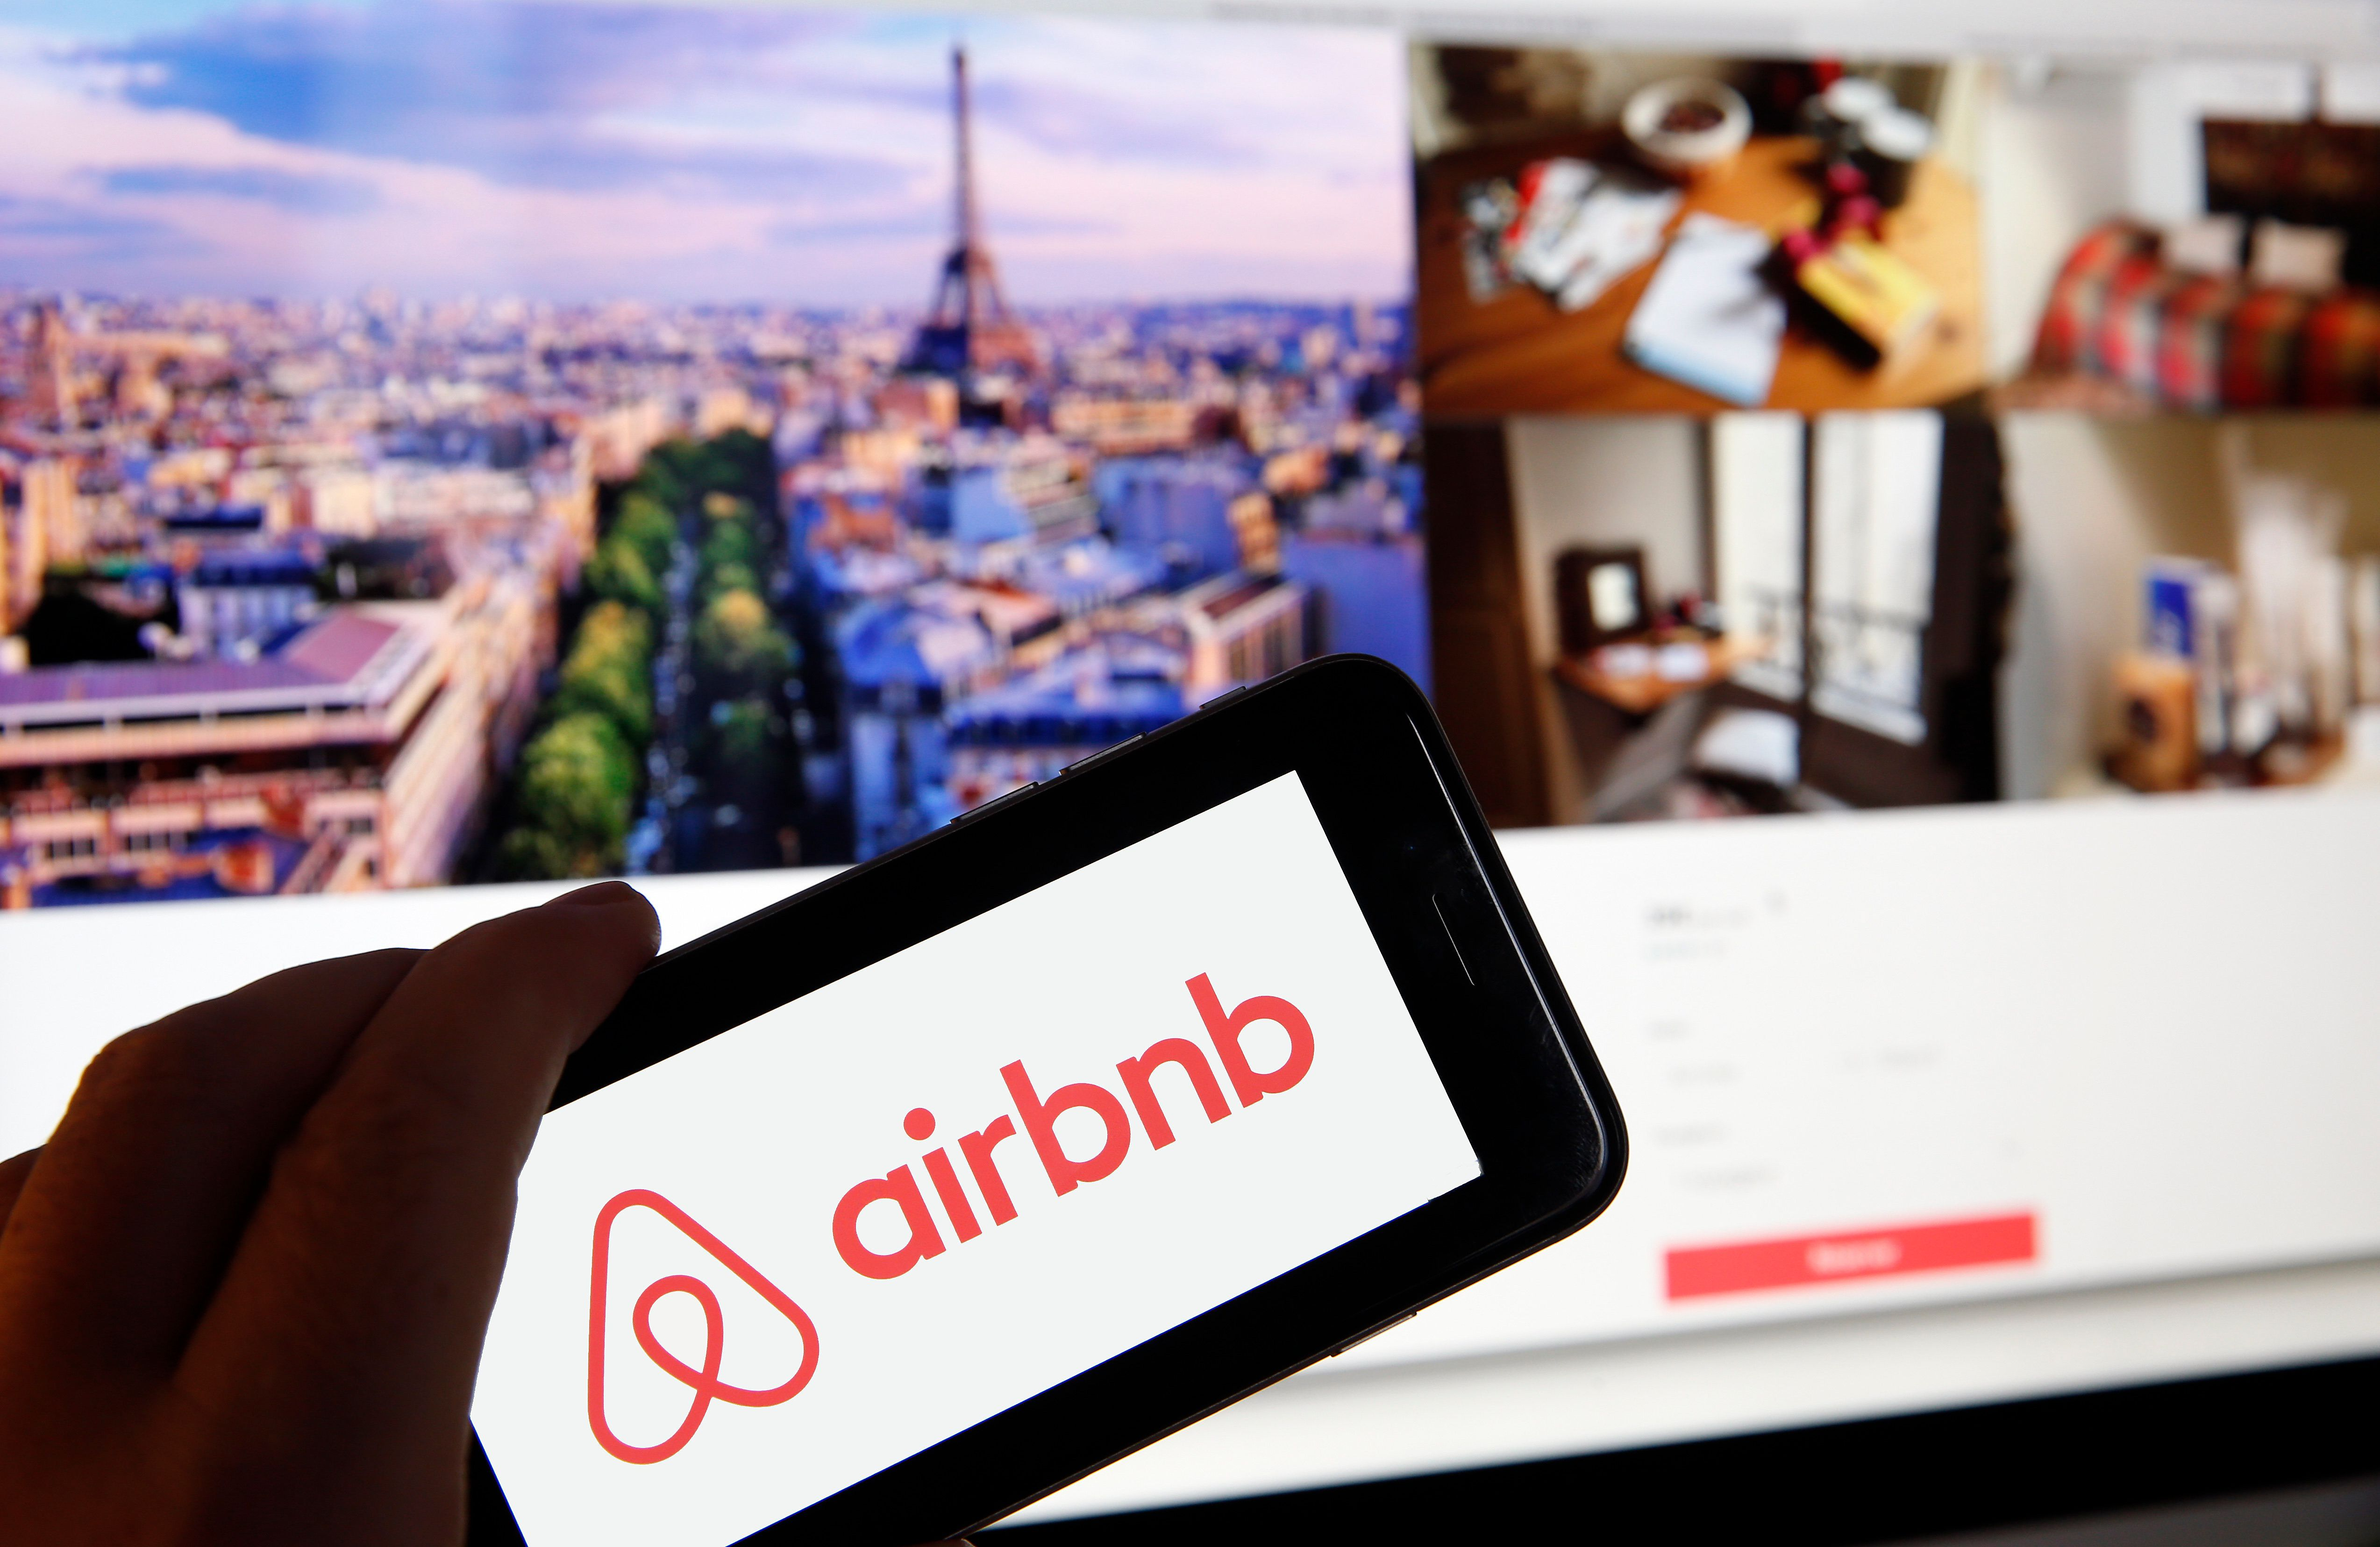 Fairbnb: Η ηθική εναλλακτική στην Airbnb που ξεκινά σε 5 ευρωπαϊκές